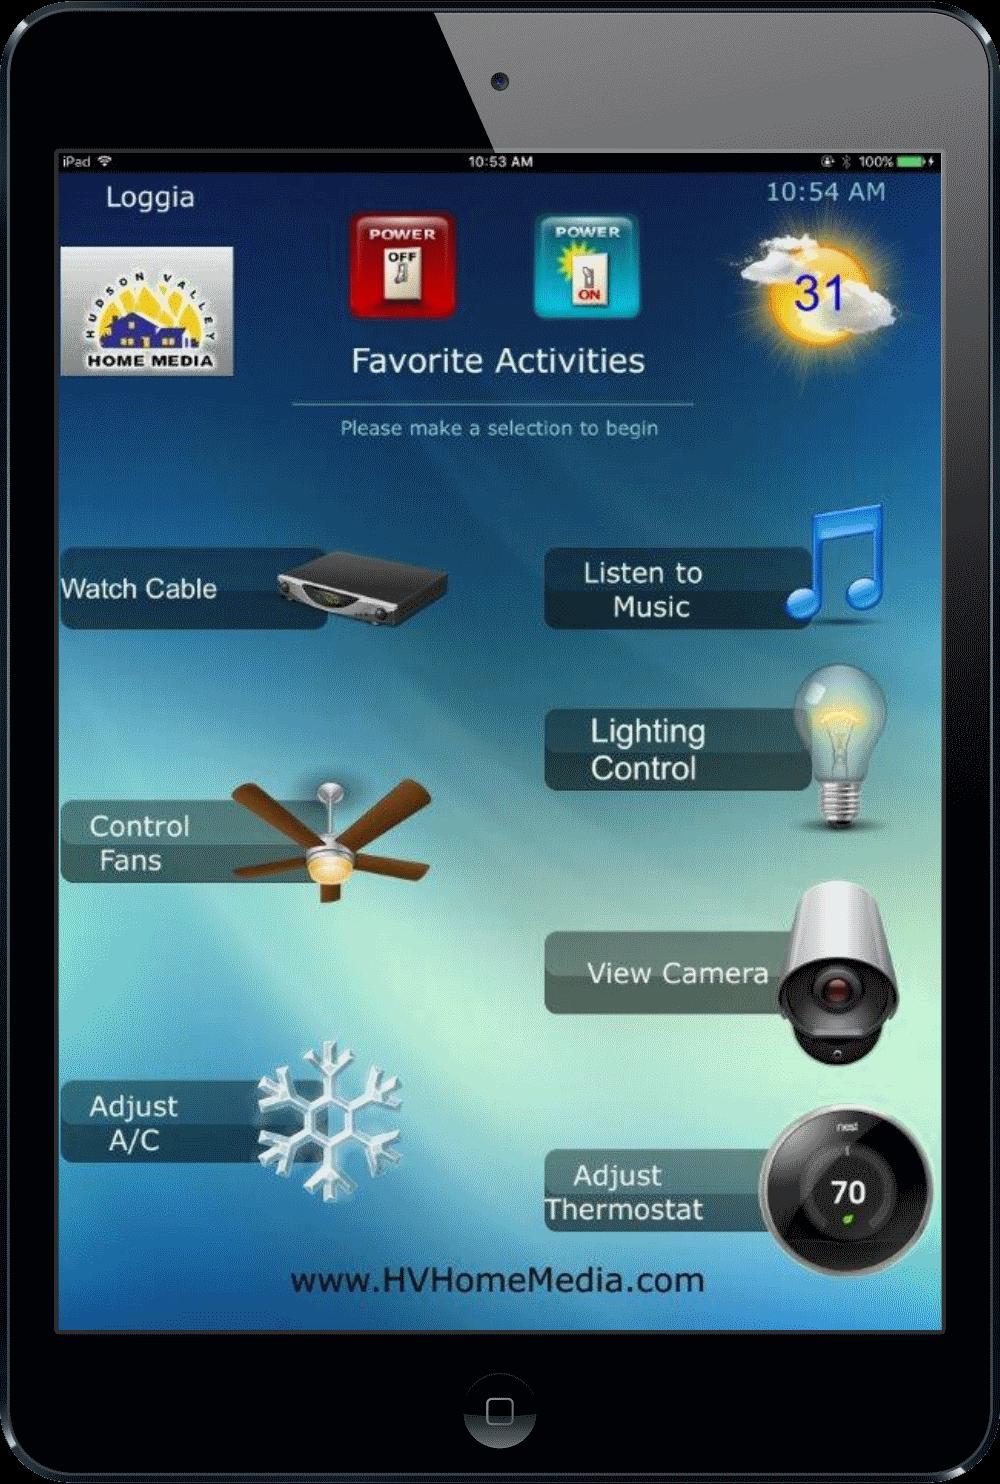 Universal Ipad Remote - Nyack, NY - HV Home Media - Hudson Valley Home Media - Smart Home Whole House Automation